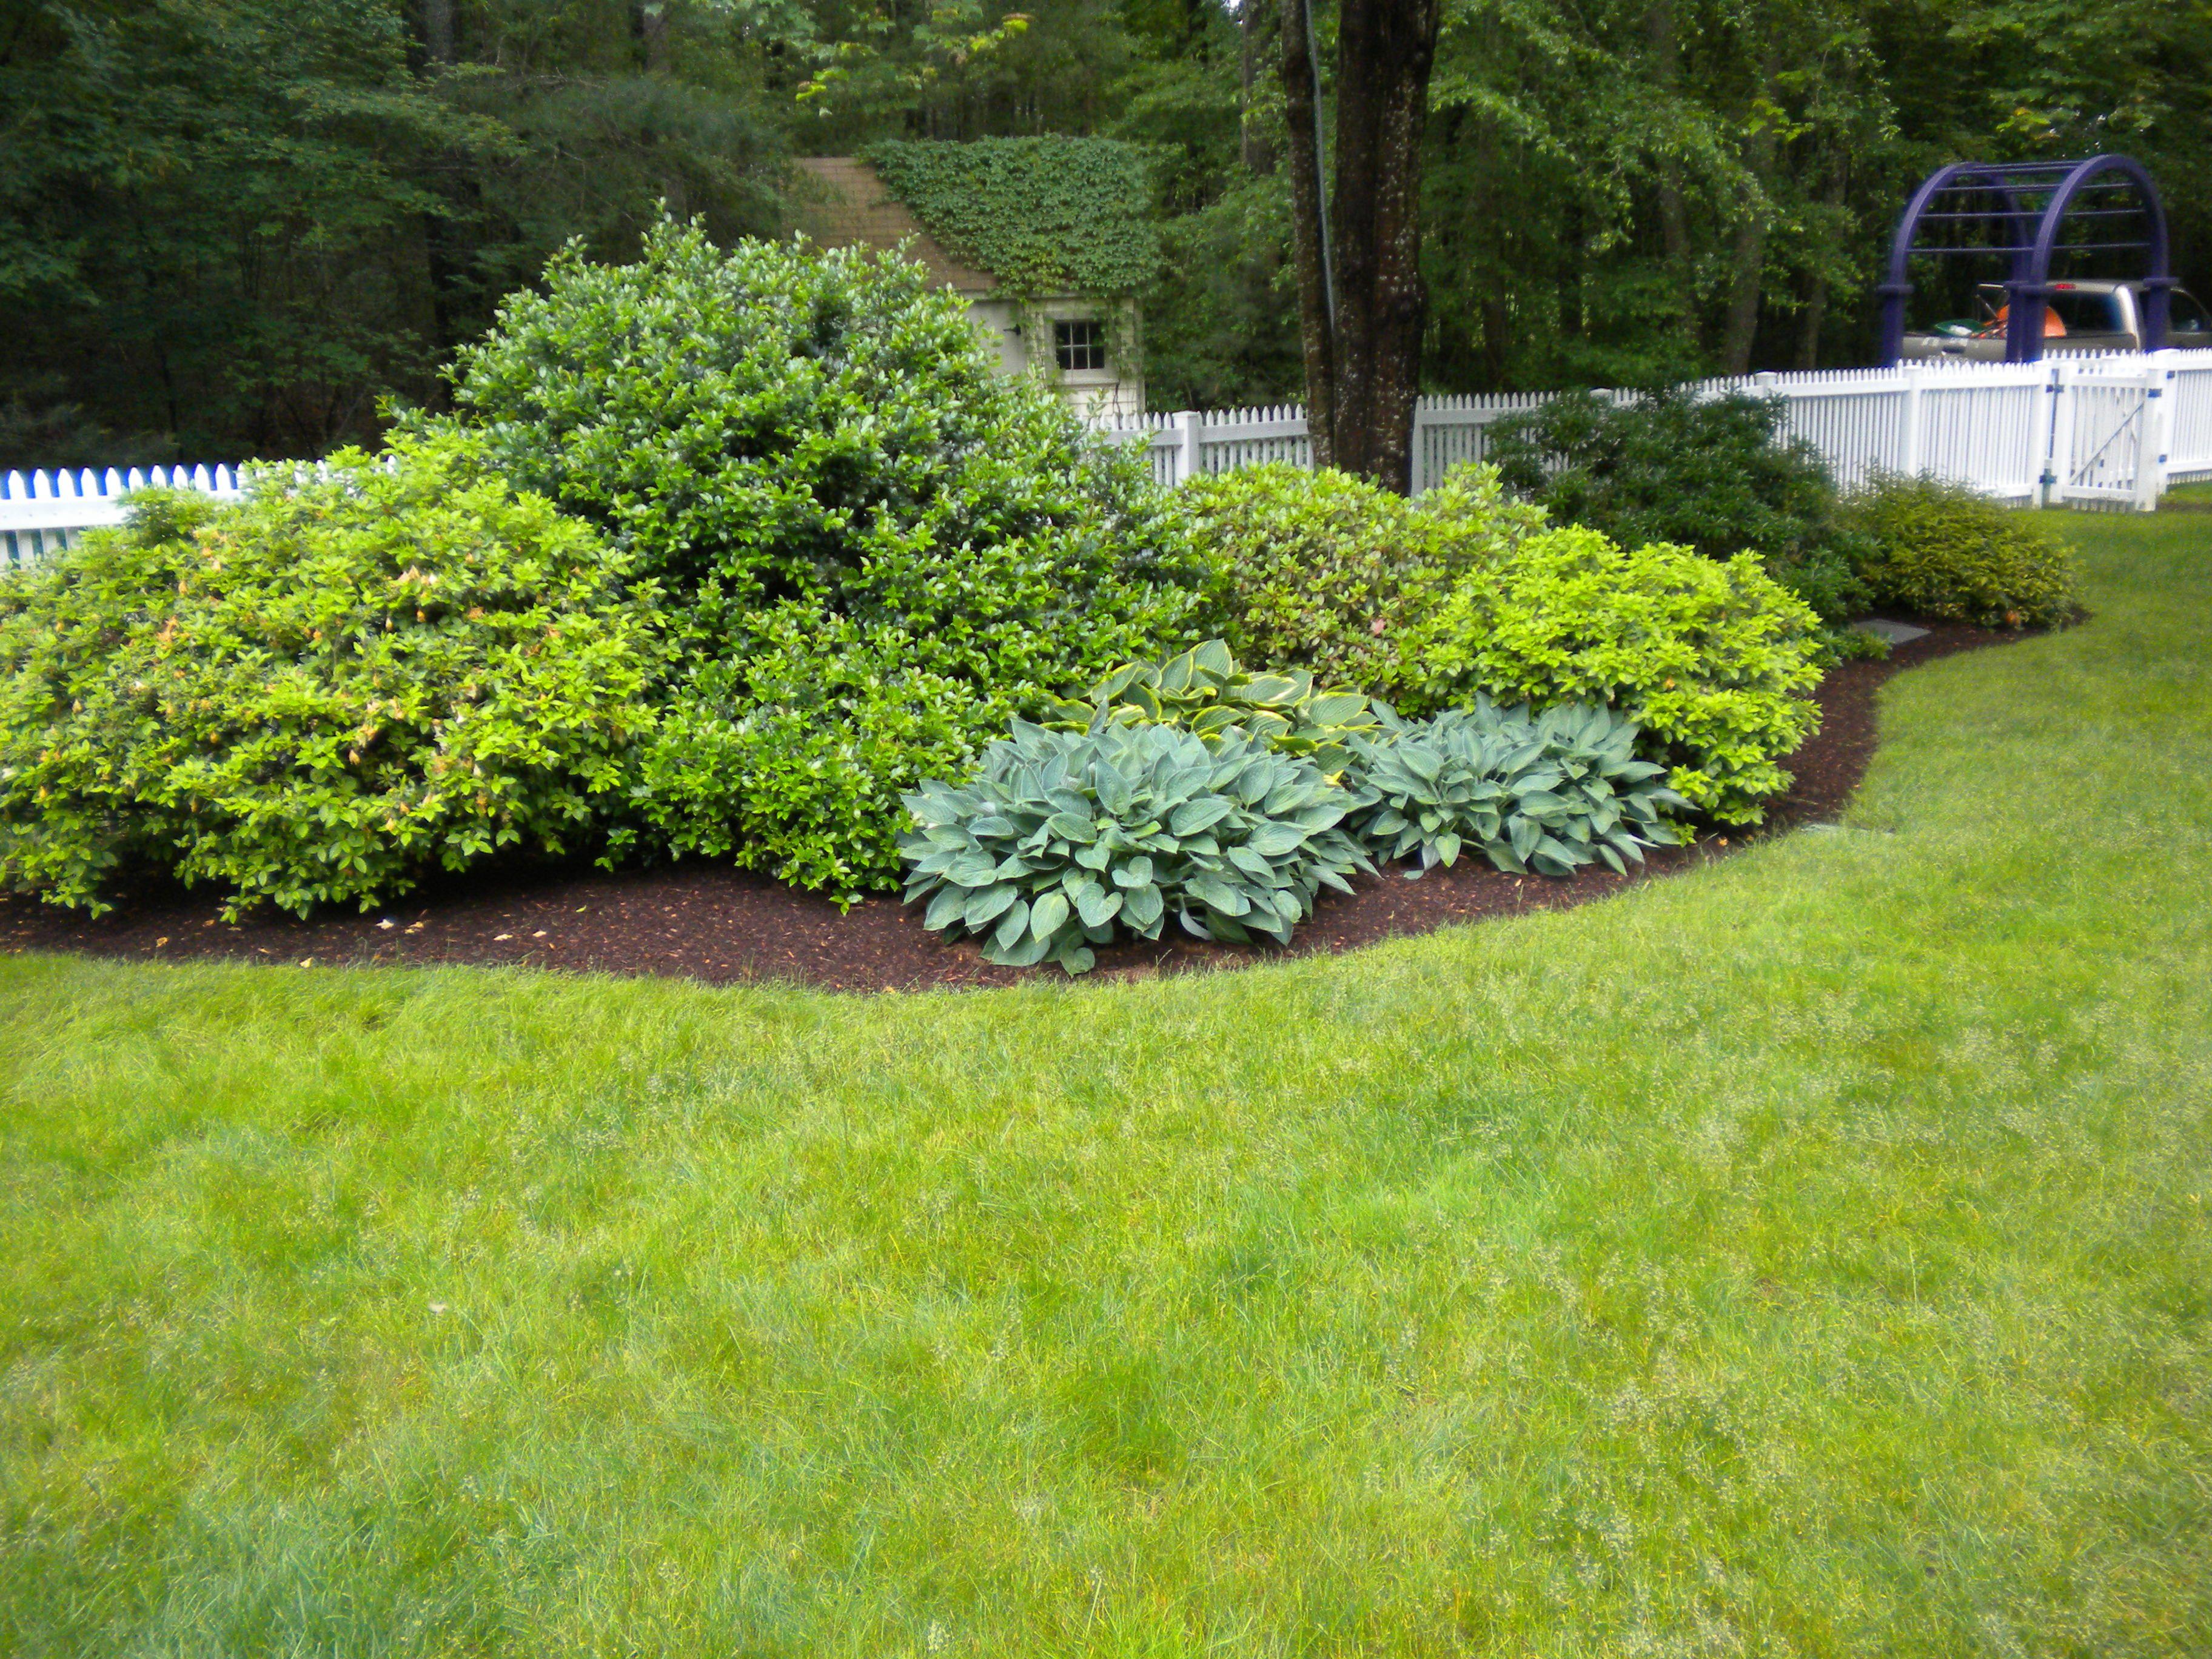 popular landscaping landscaping shrubs corpus christi texas and gardening landscaping. Black Bedroom Furniture Sets. Home Design Ideas